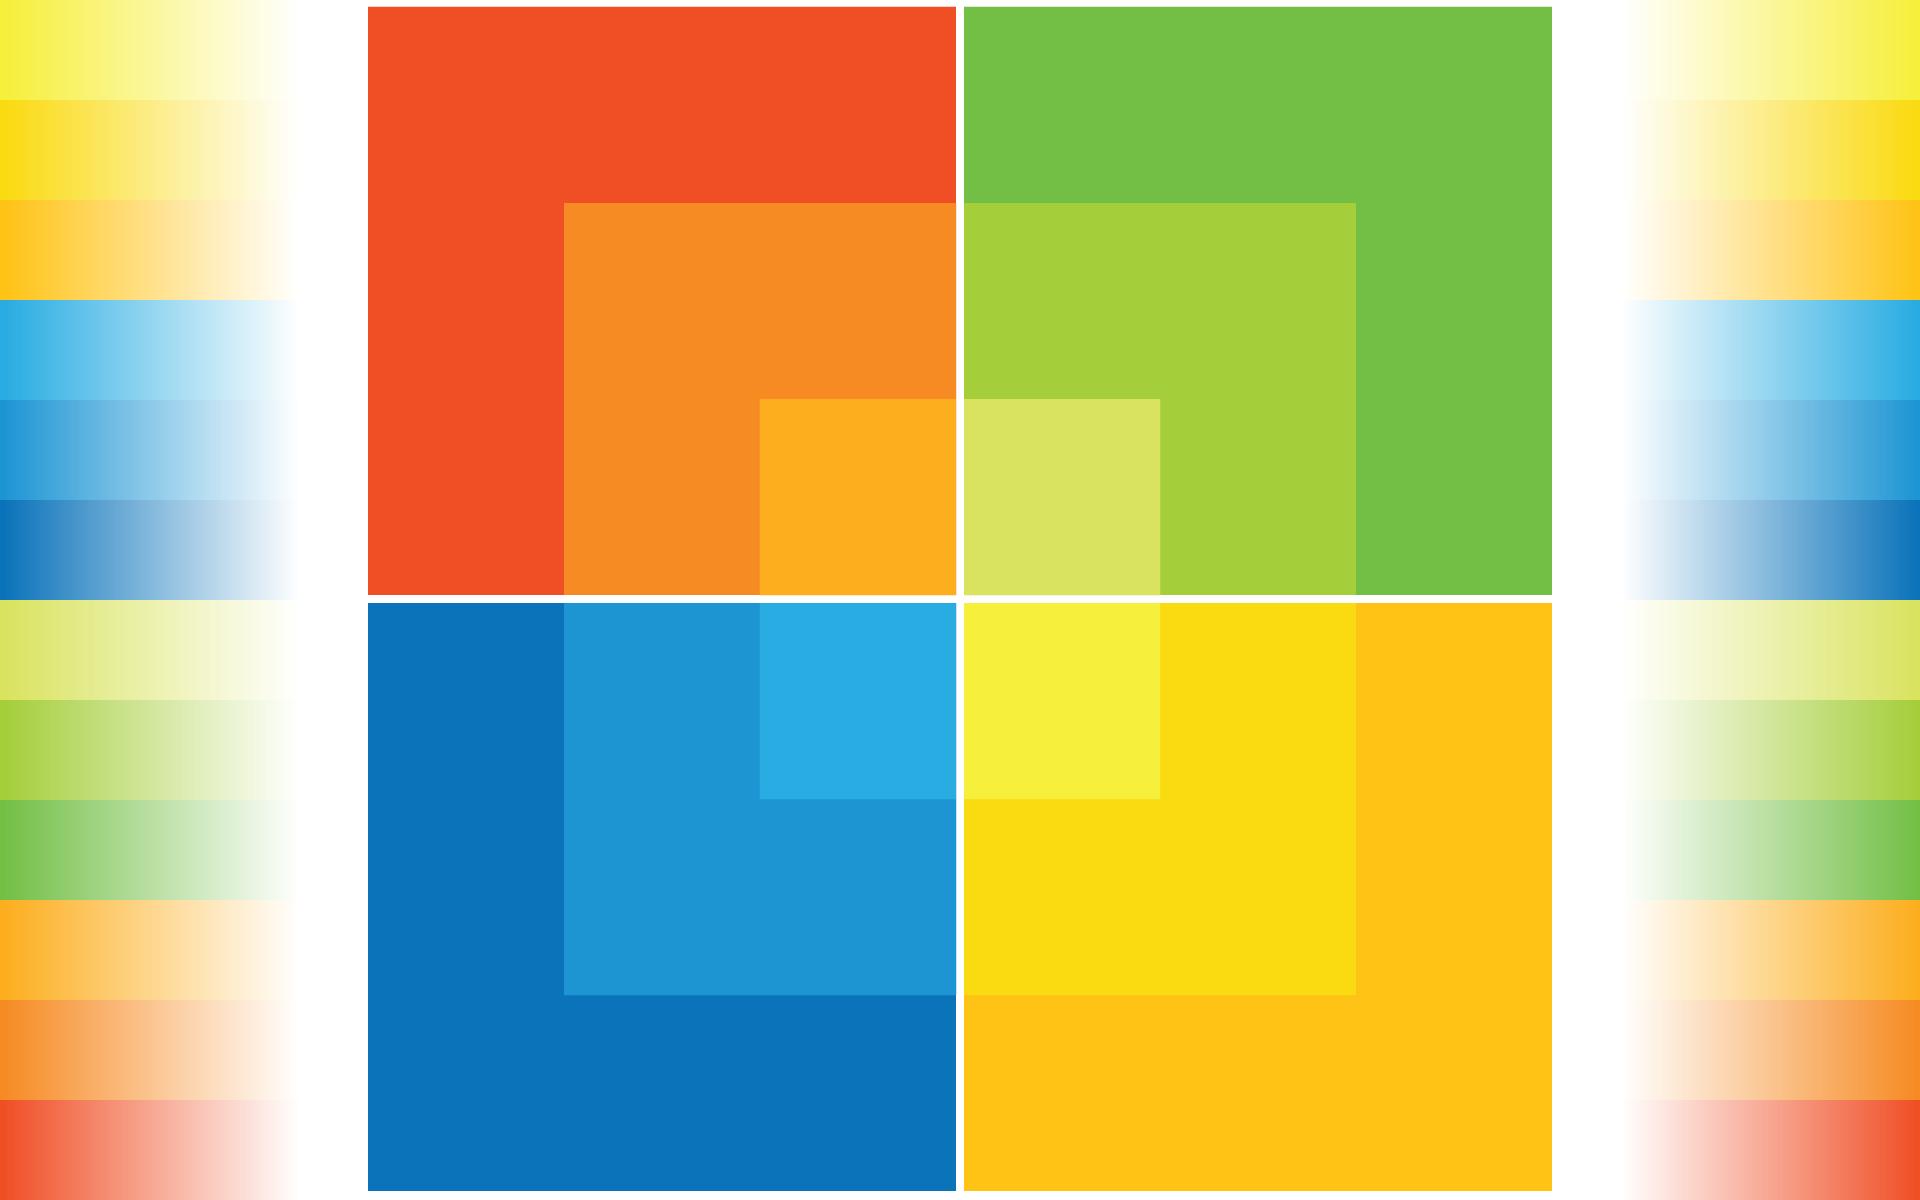 18 000 Microsoft Employees Lose Their Jobs News Indie Db